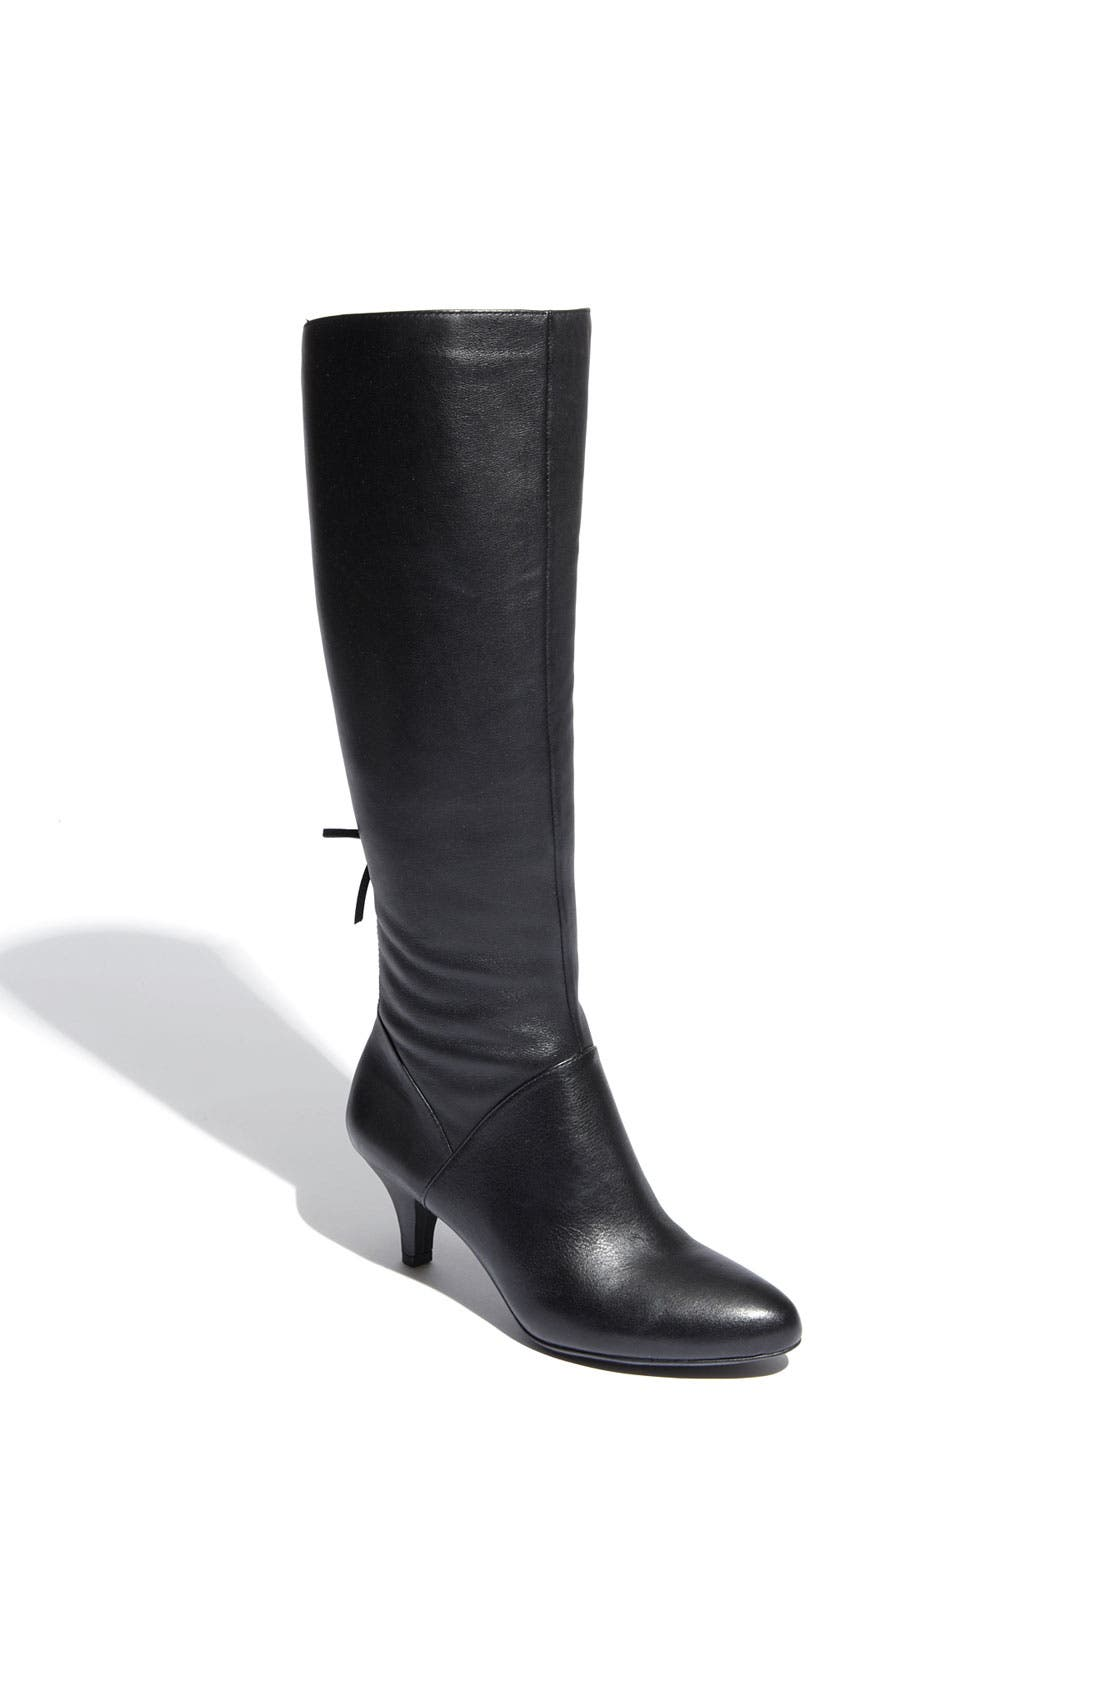 Alternate Image 1 Selected - Naturalizer 'Dinka' Boot